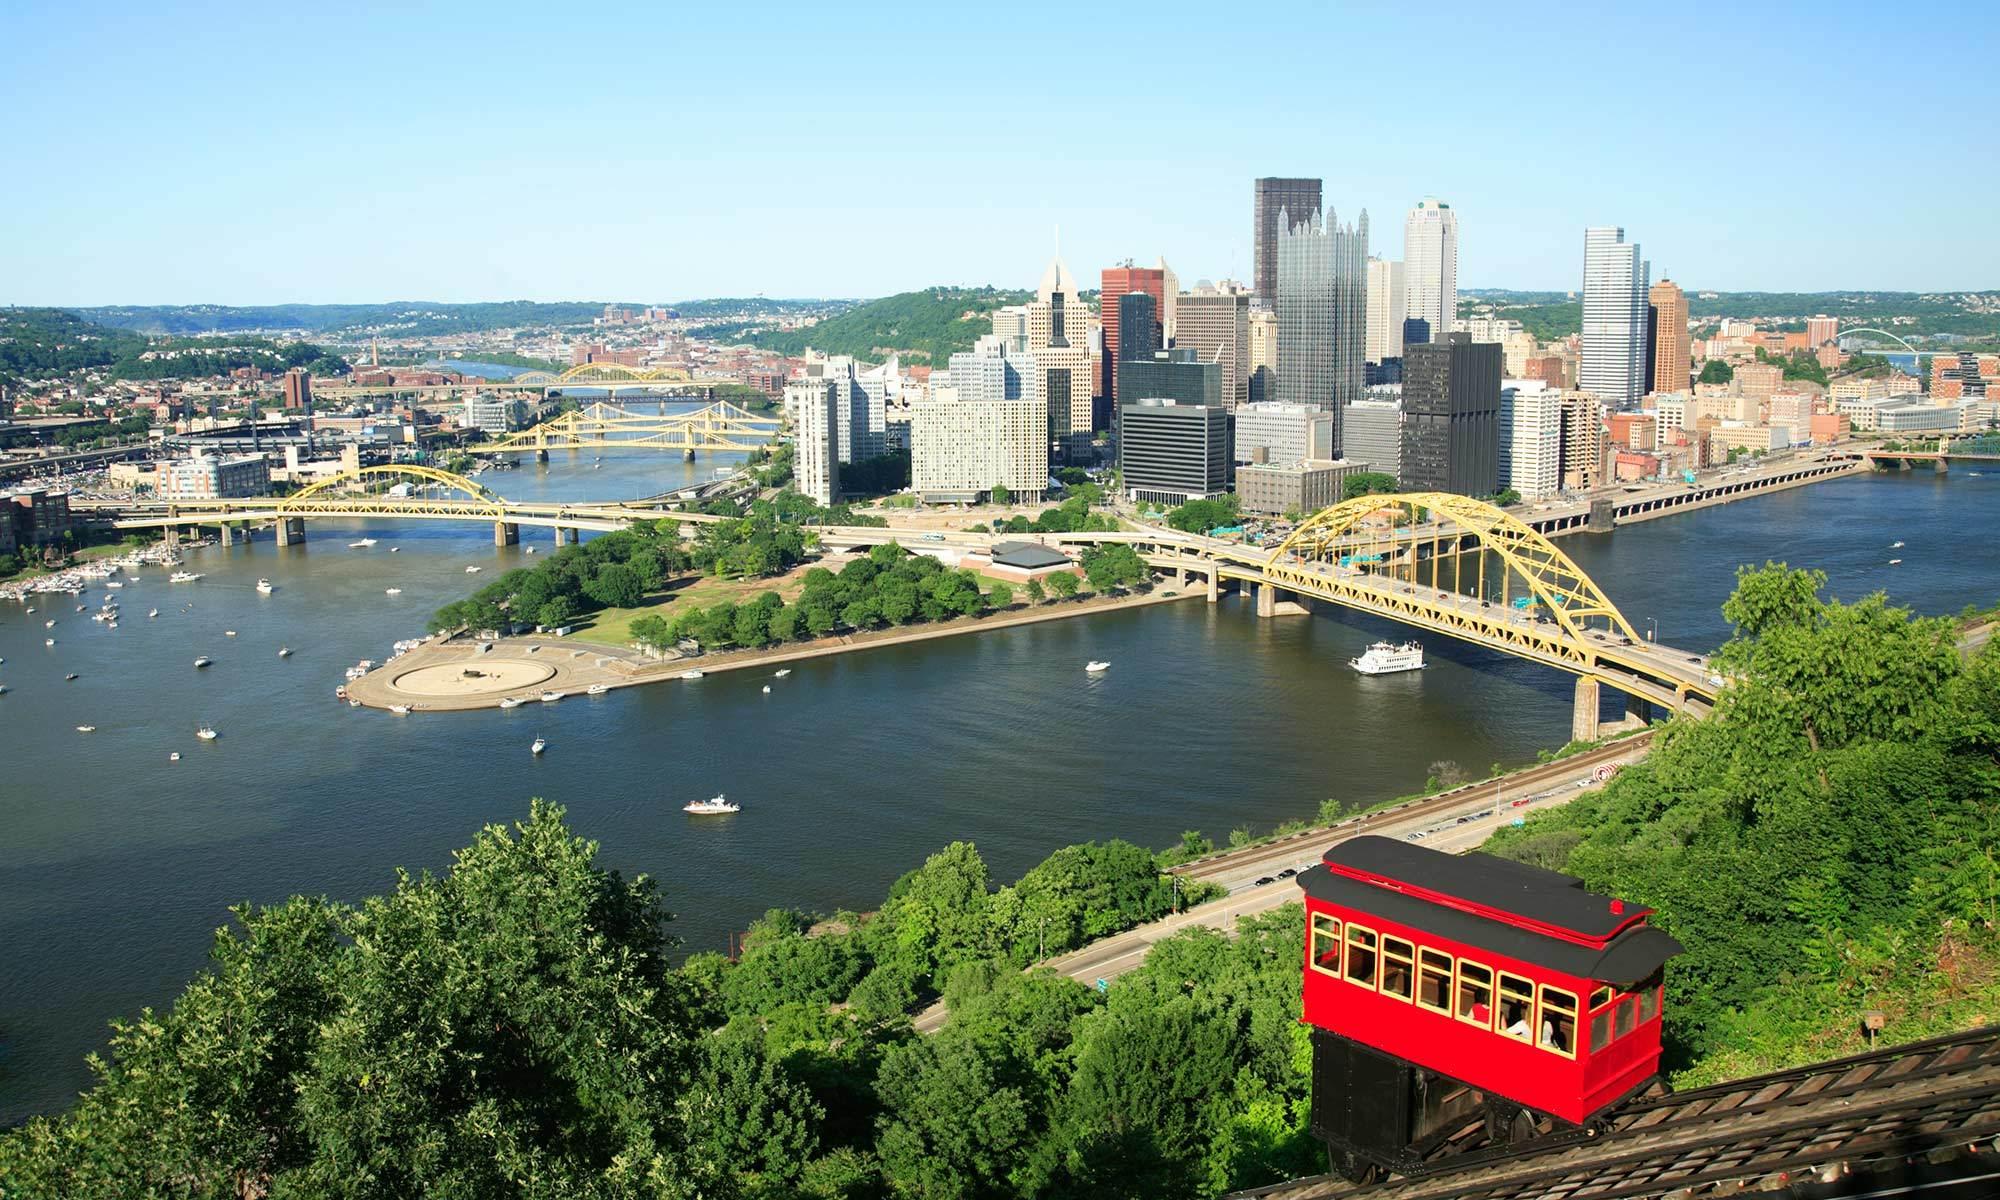 A beautiful view of Pittsburgh, PA